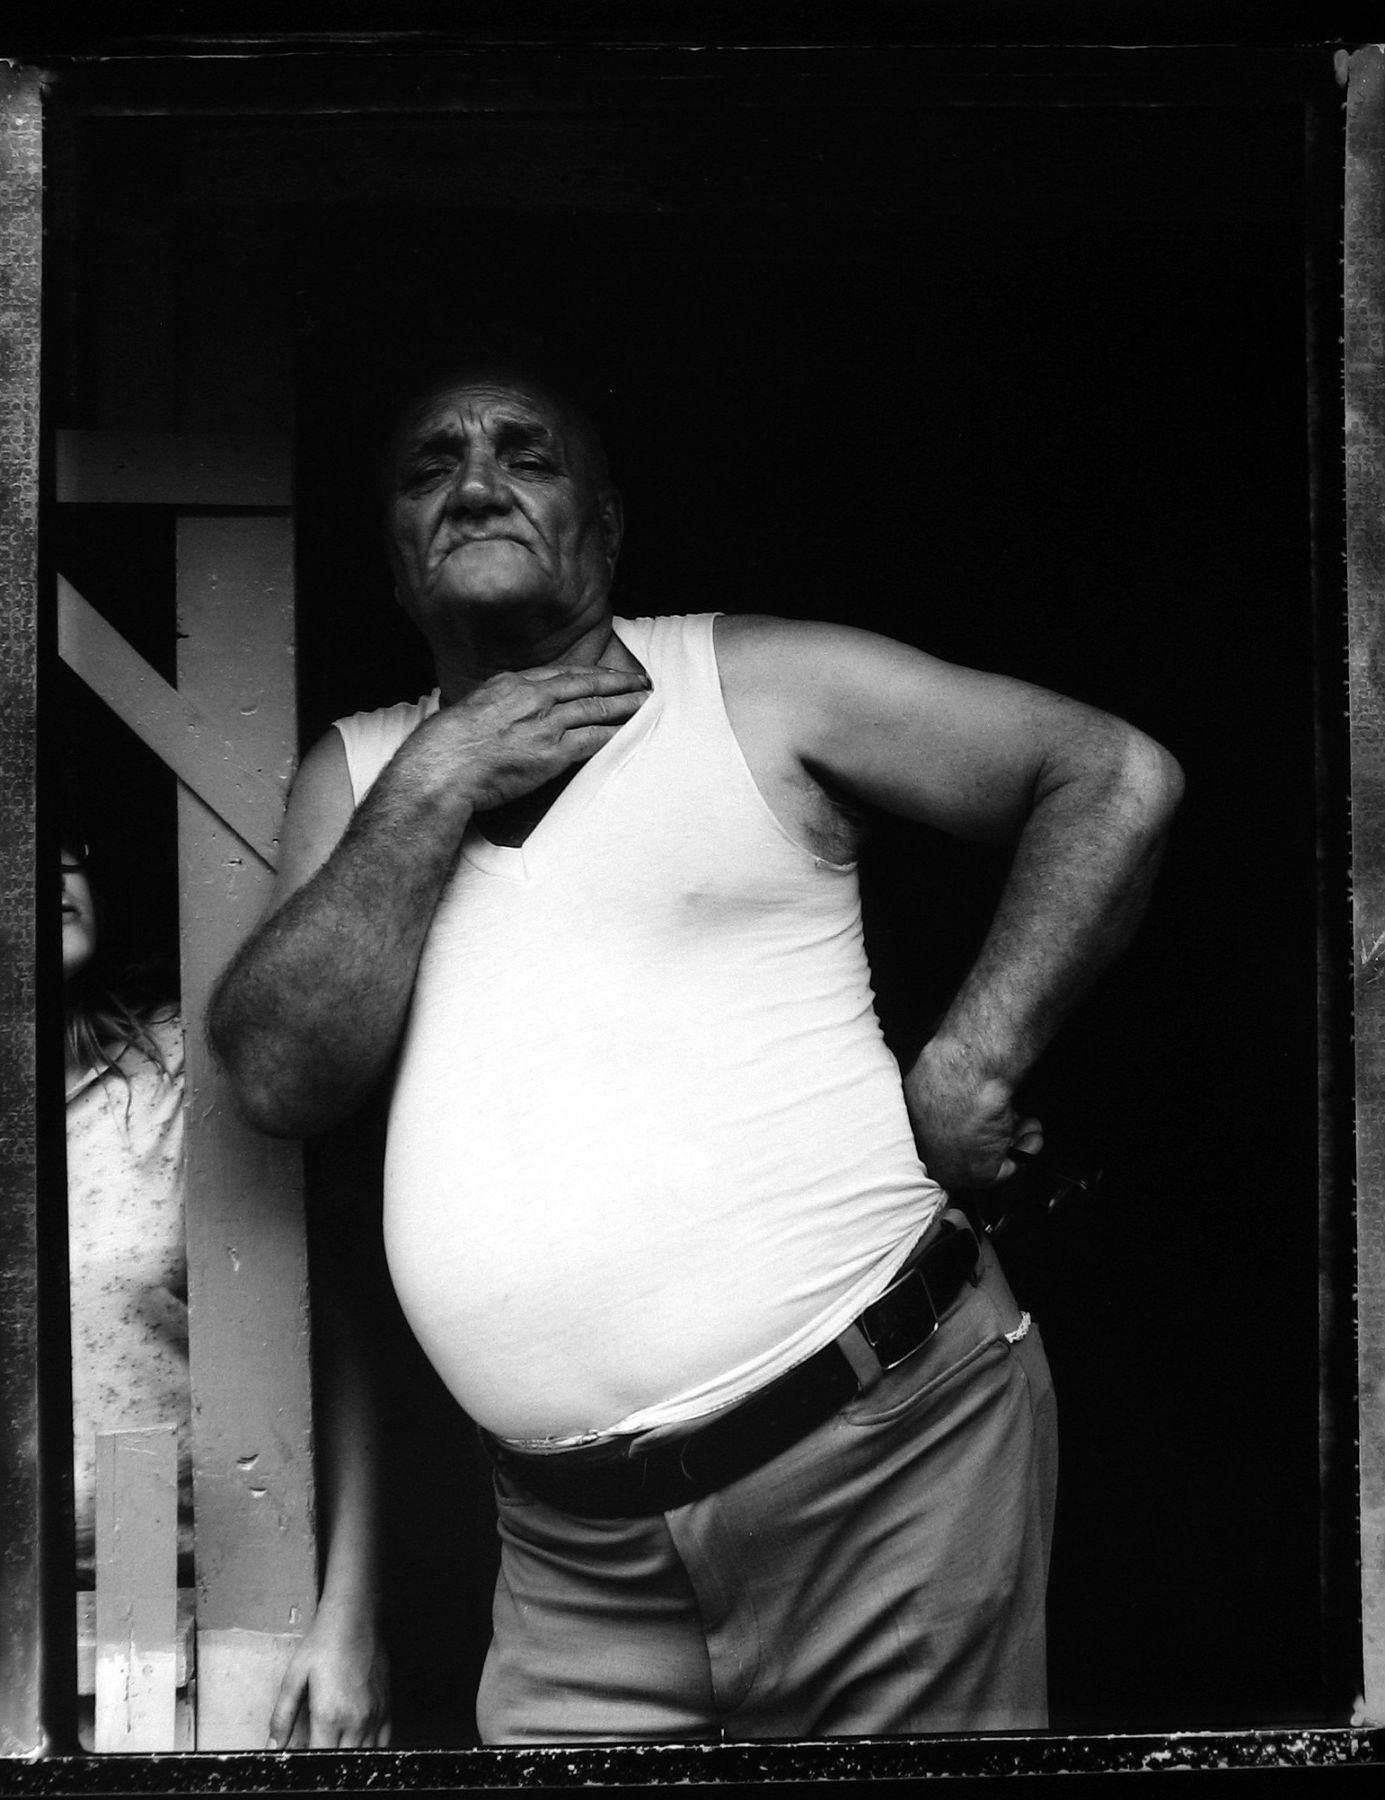 Bill Burke - Reverend William Beegle, Bellaire, Ohio, 1979 - Howard Greenberg Gallery - 2018